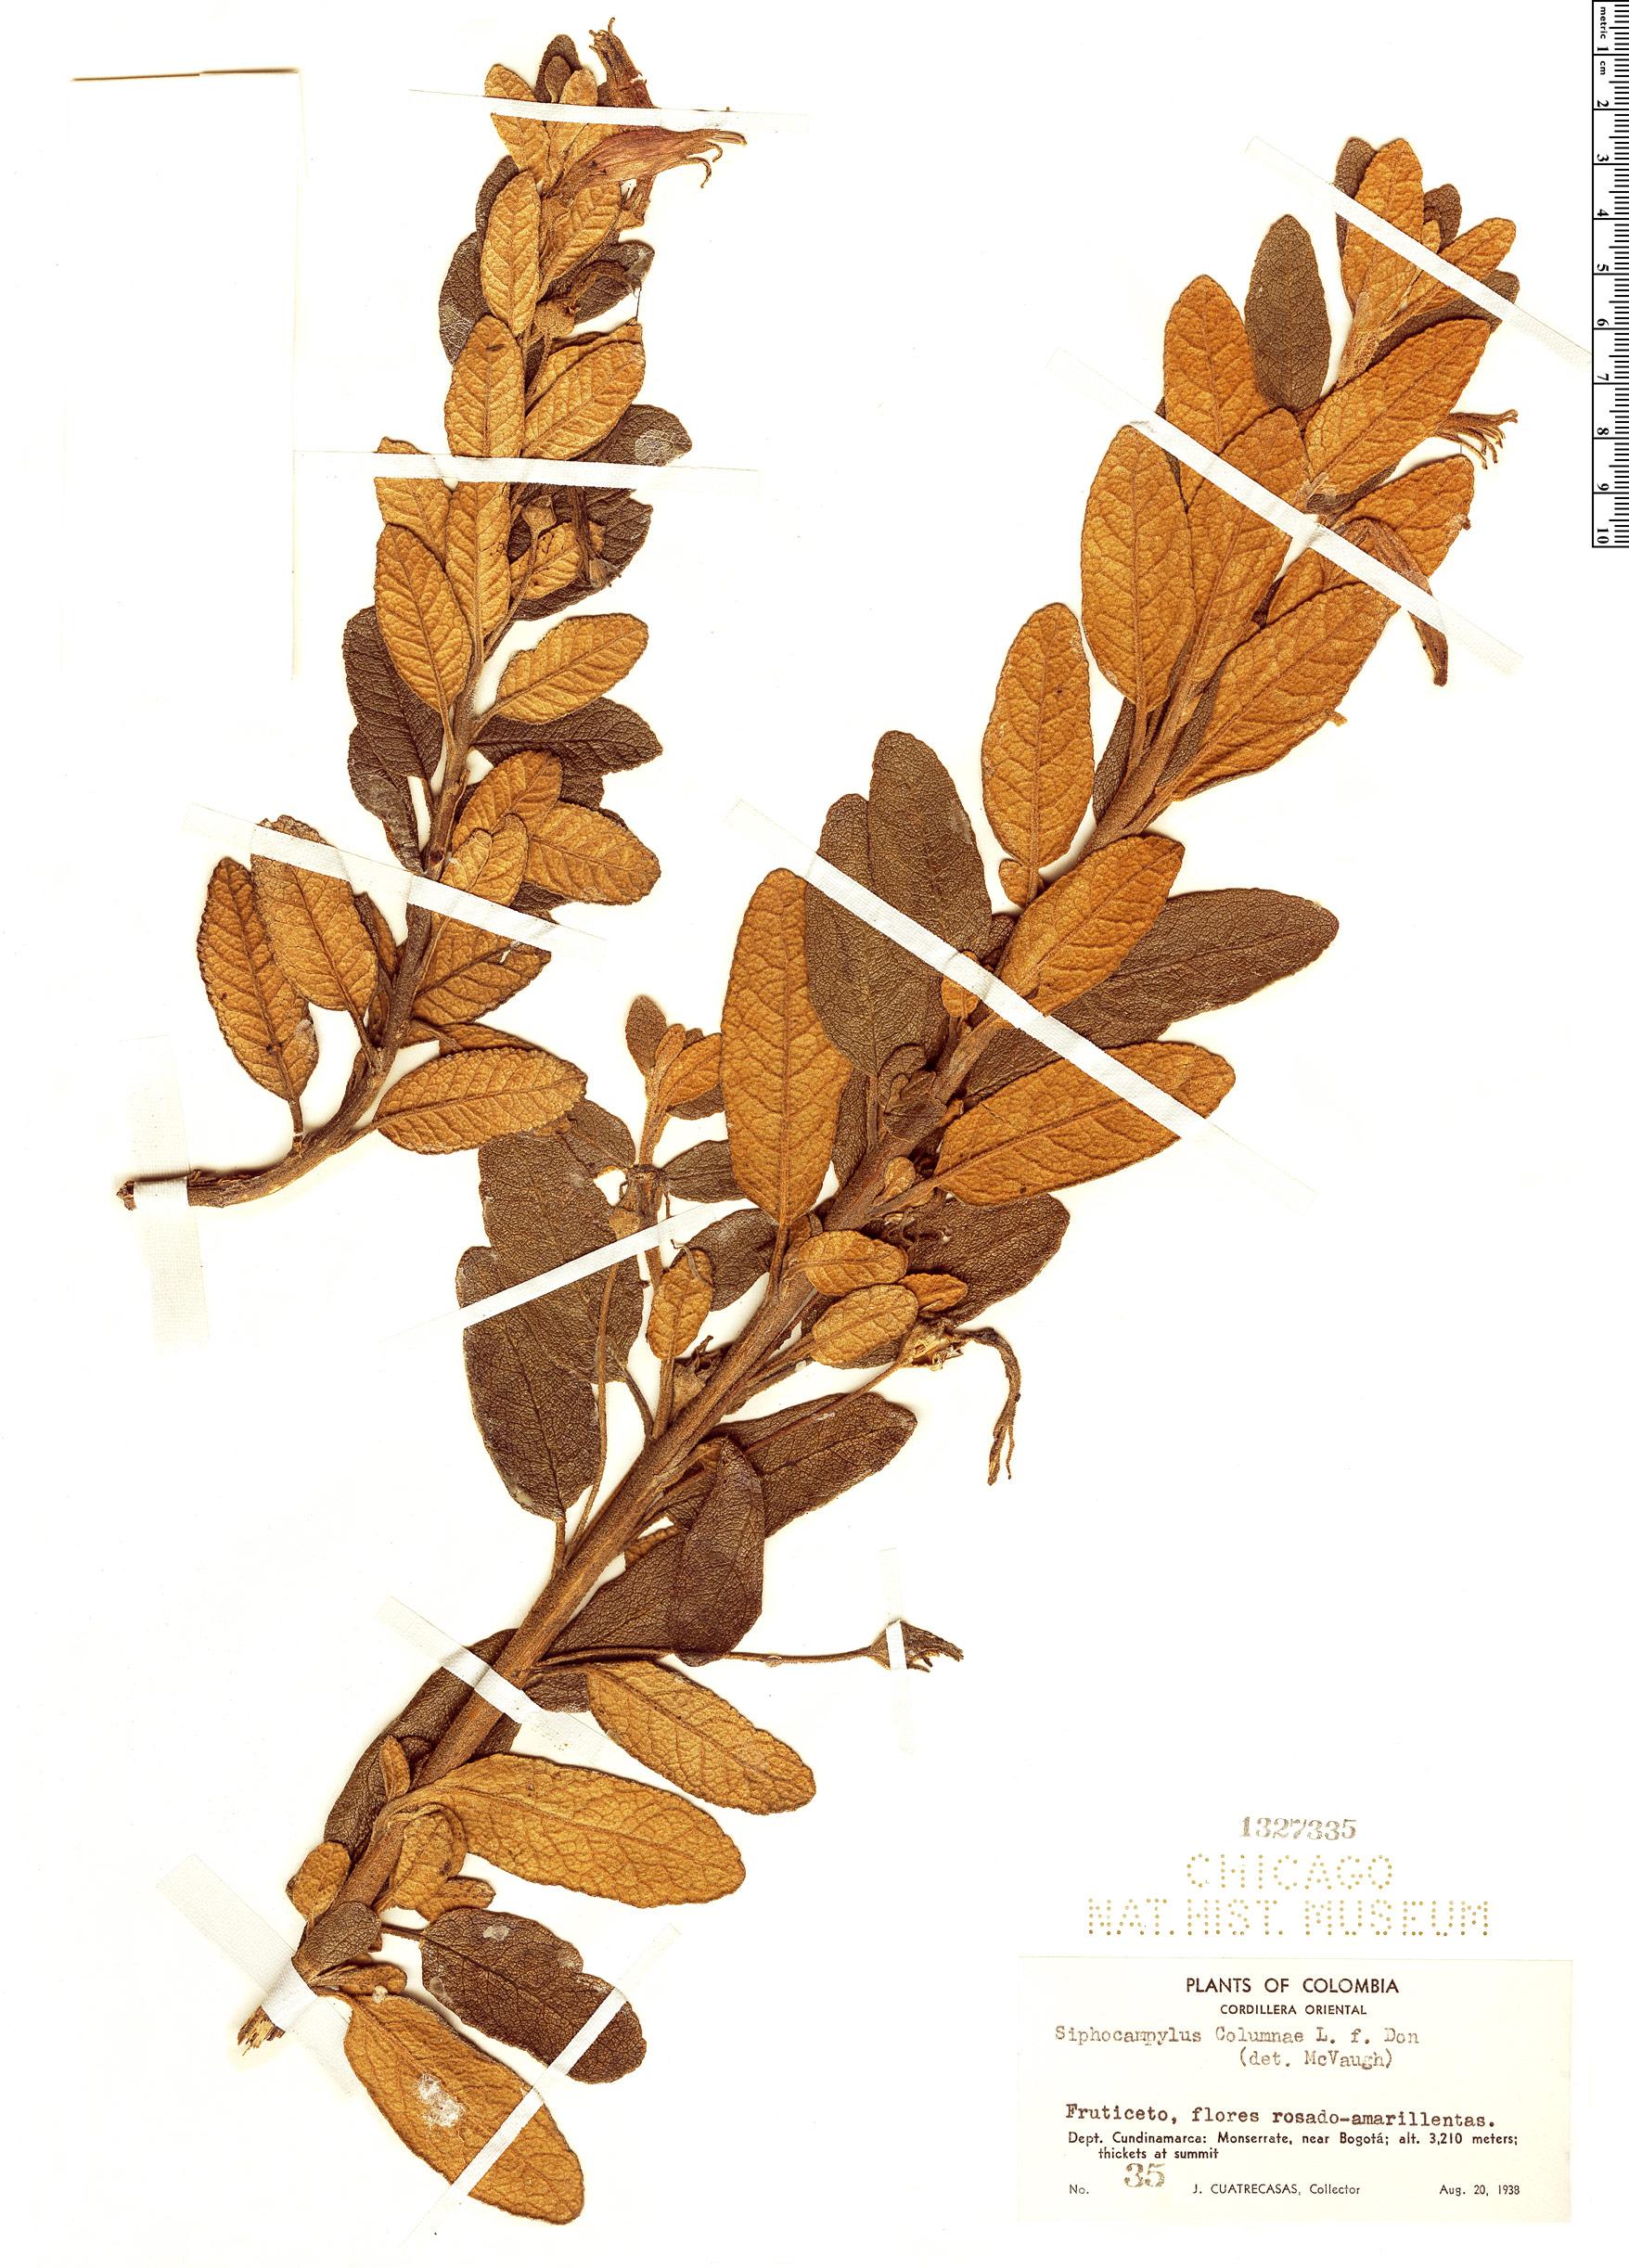 Specimen: Siphocampylus columnae